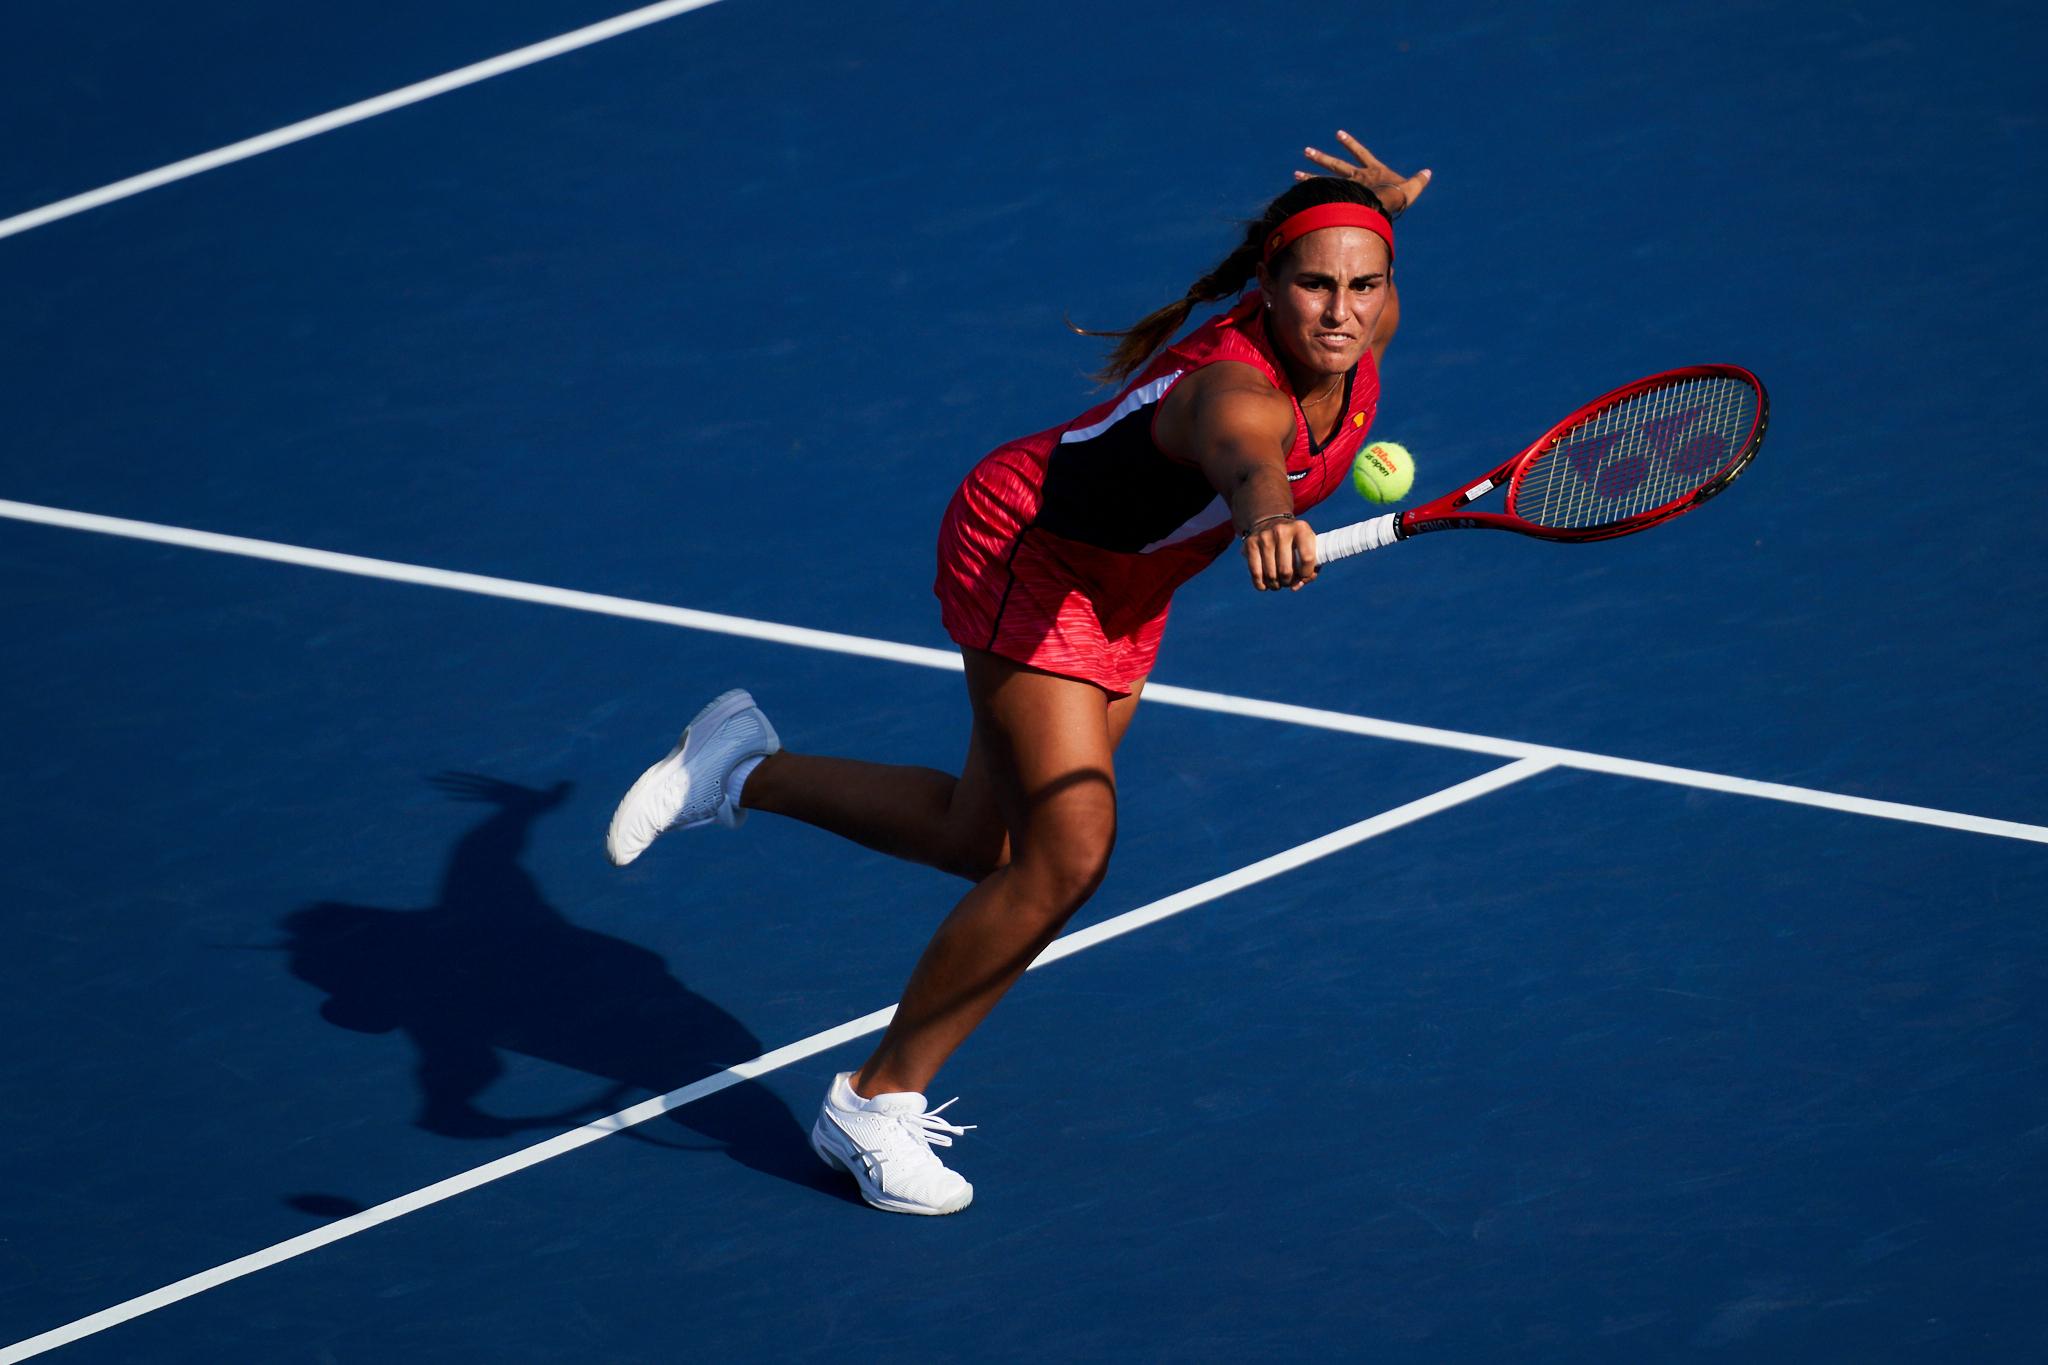 Monica Puig, Court 8, 1st Round Women's Singles  Sony A9, Sony 70-200mm f2.8 GM-OSS, Sony FE 1.4x teleconverter